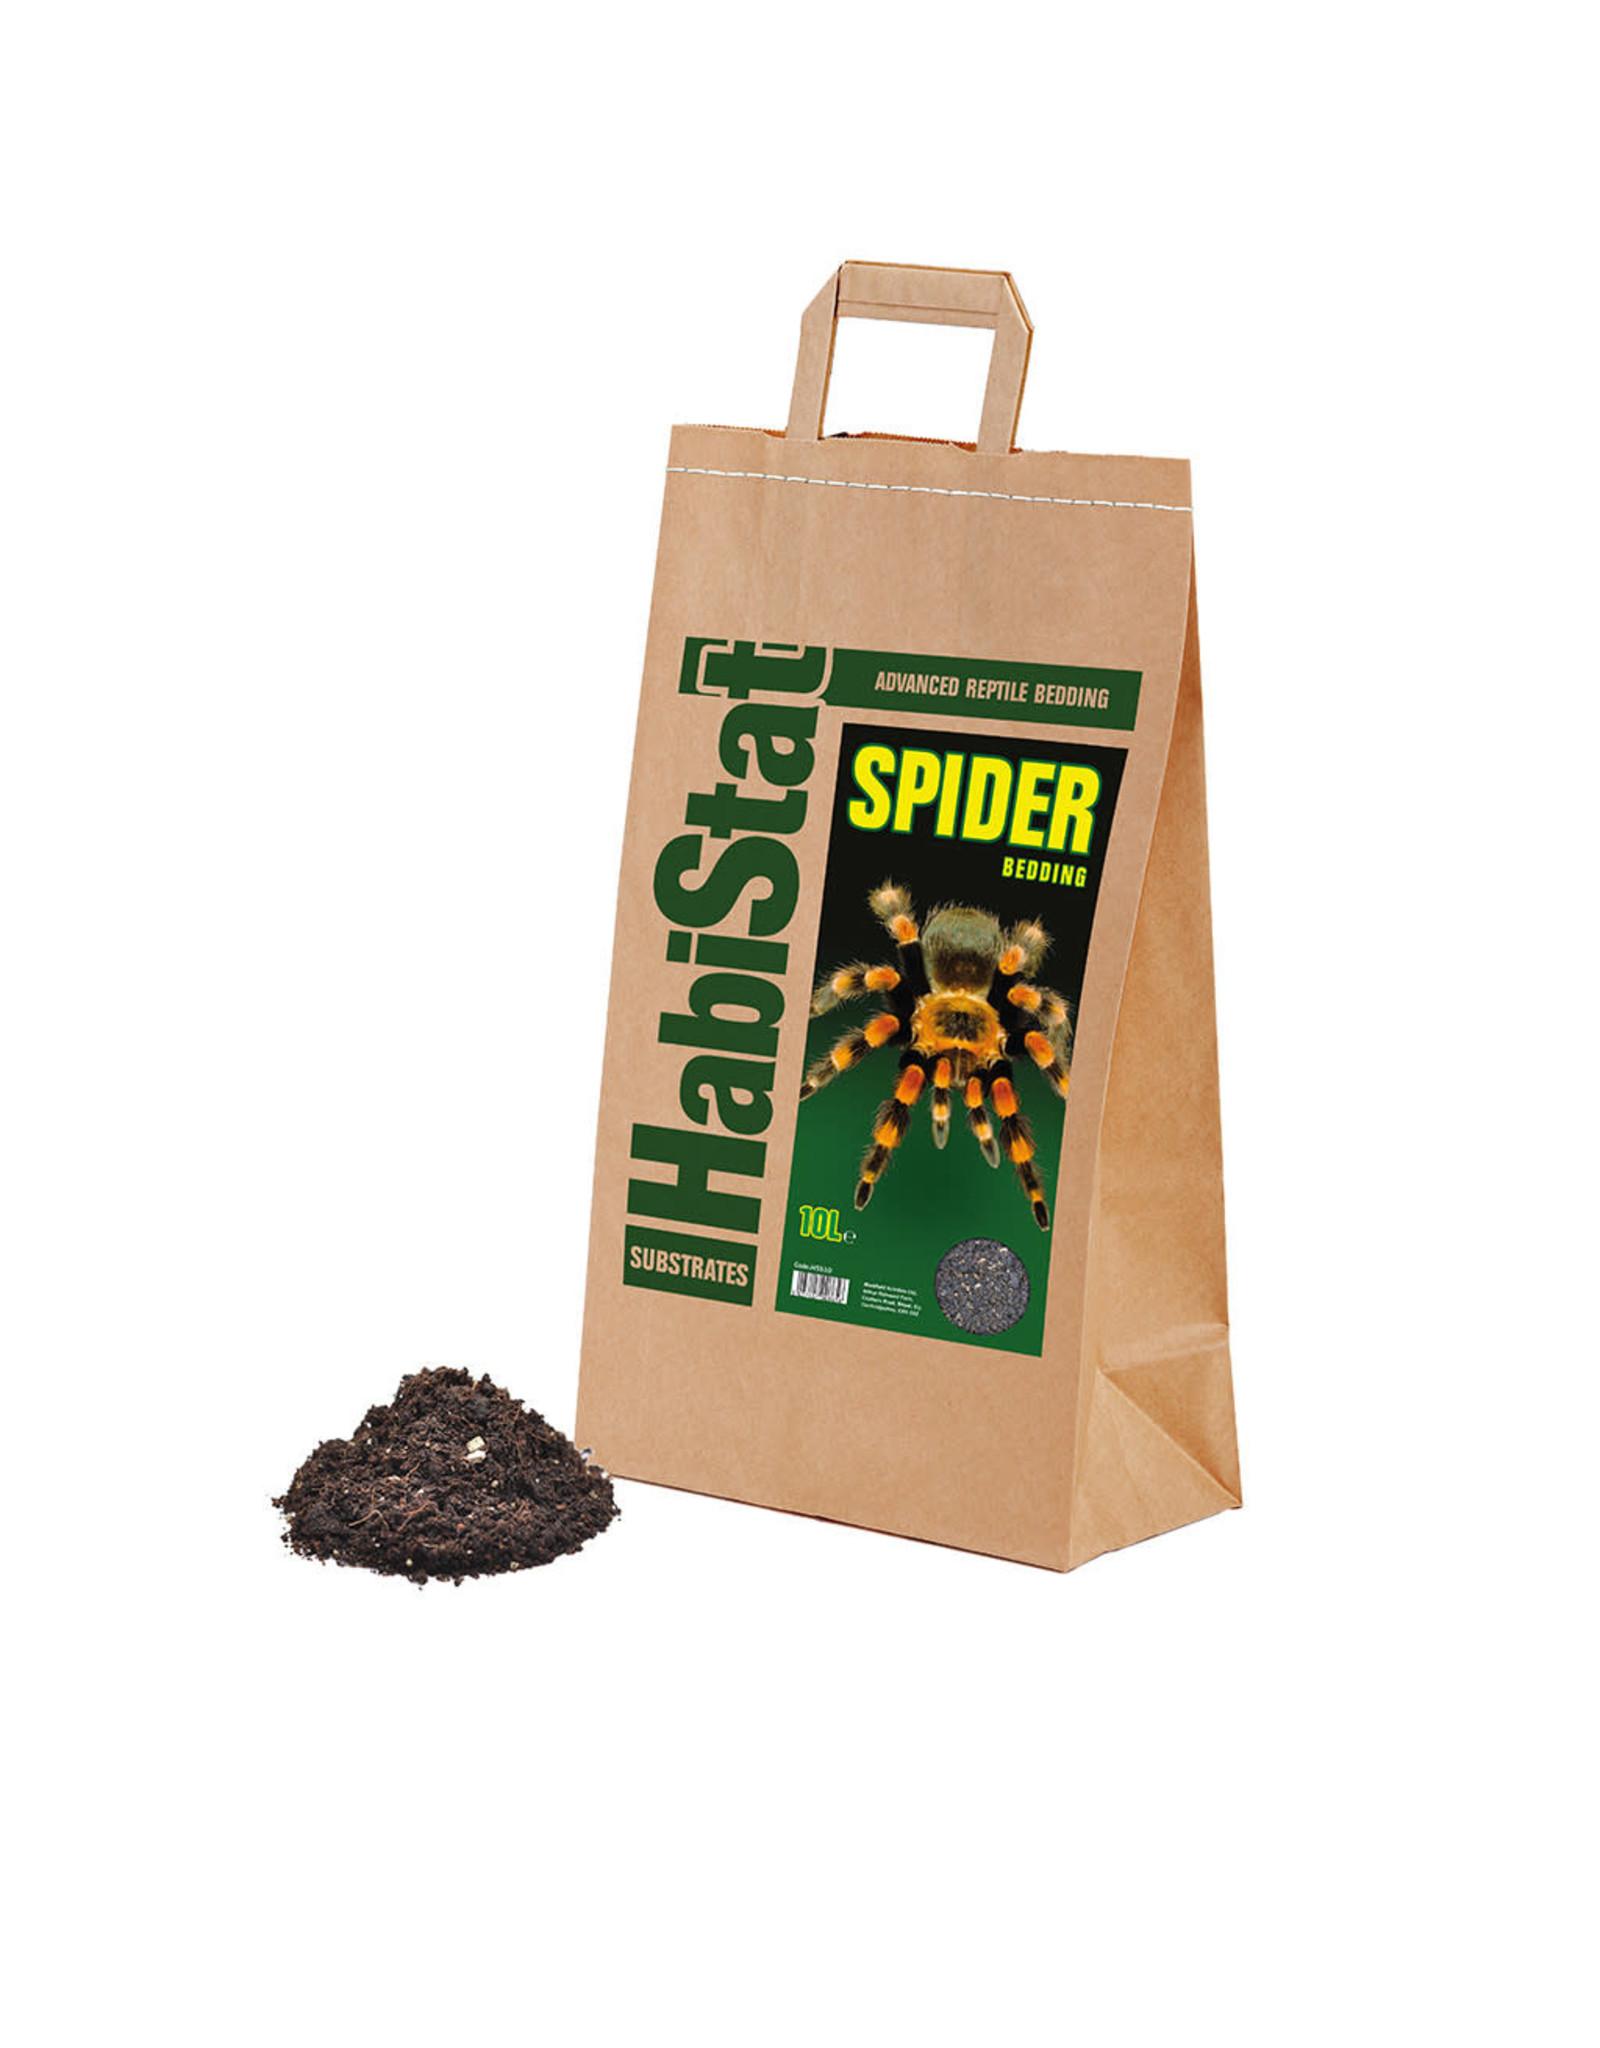 Habistat Habistat Spider Bedding 10L